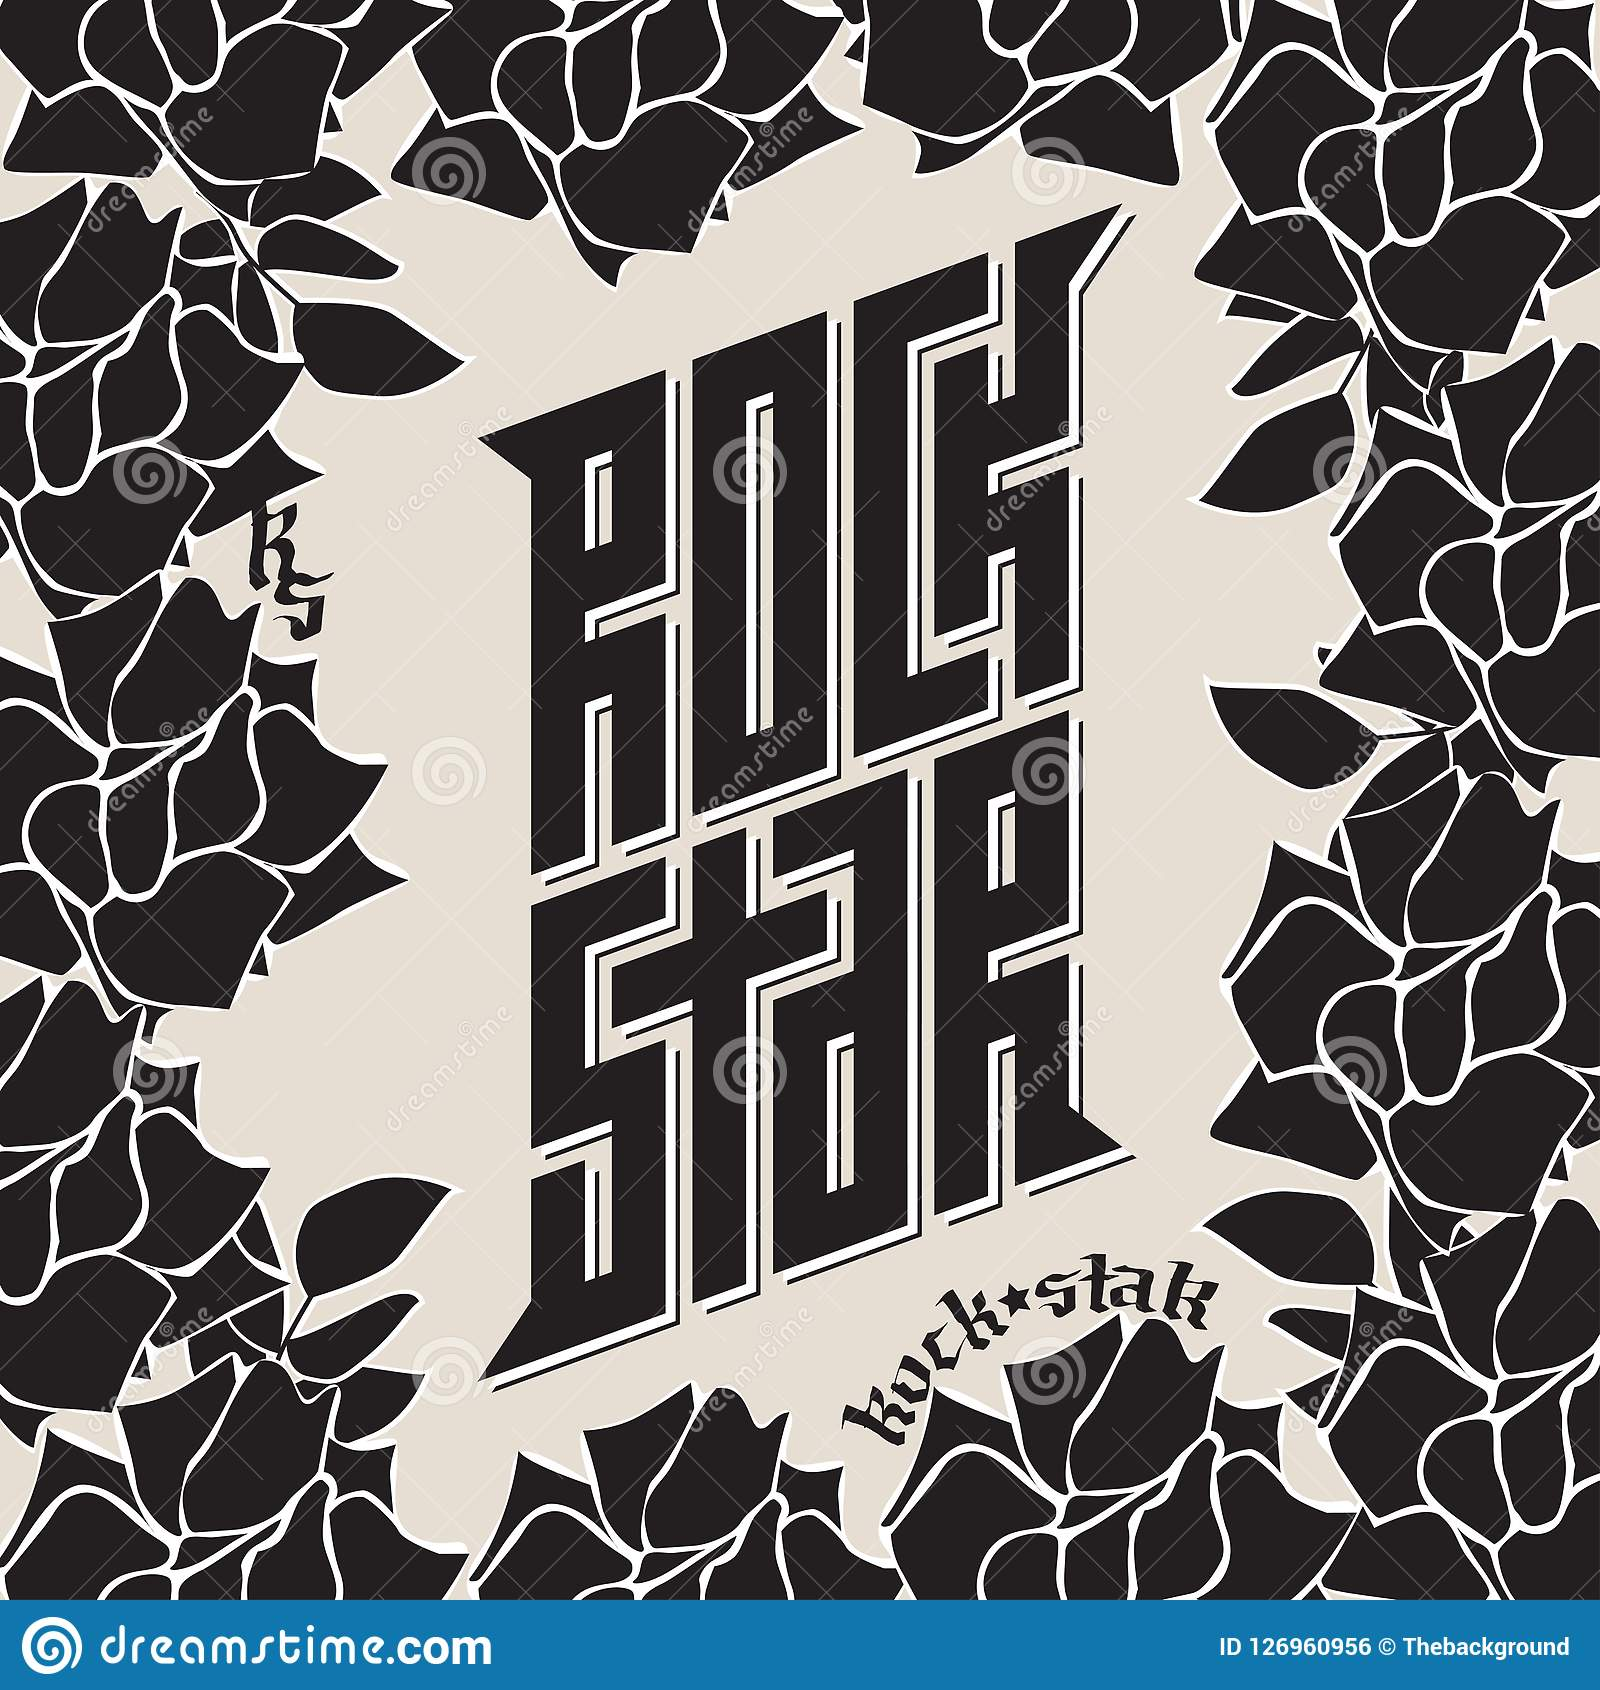 Rock Star Tattoo Music Poster Or Band Label Rockstar T Shirt